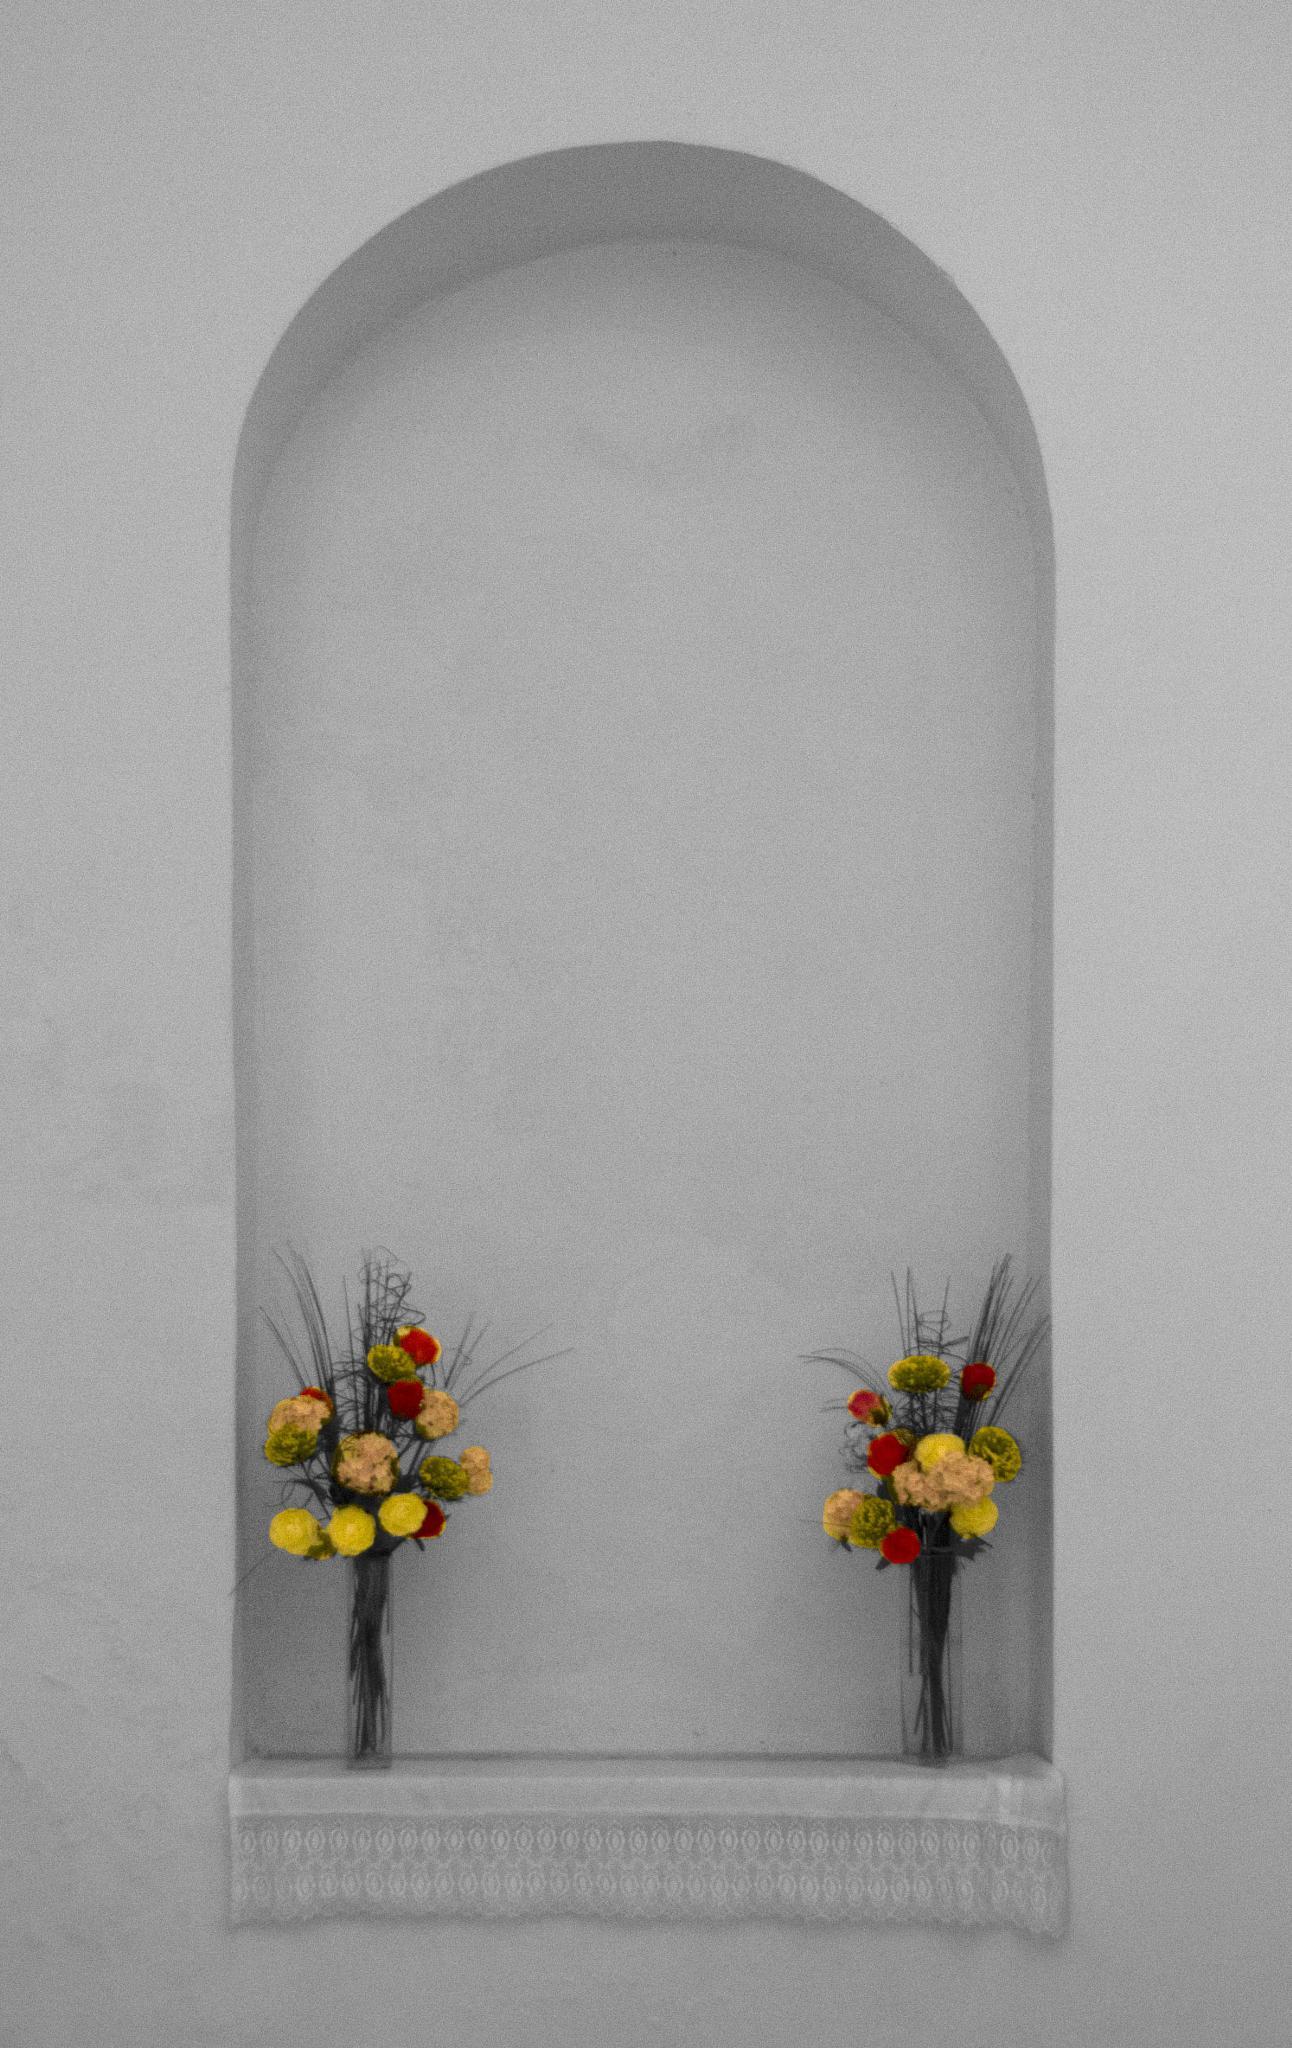 Flowers by trevor keville